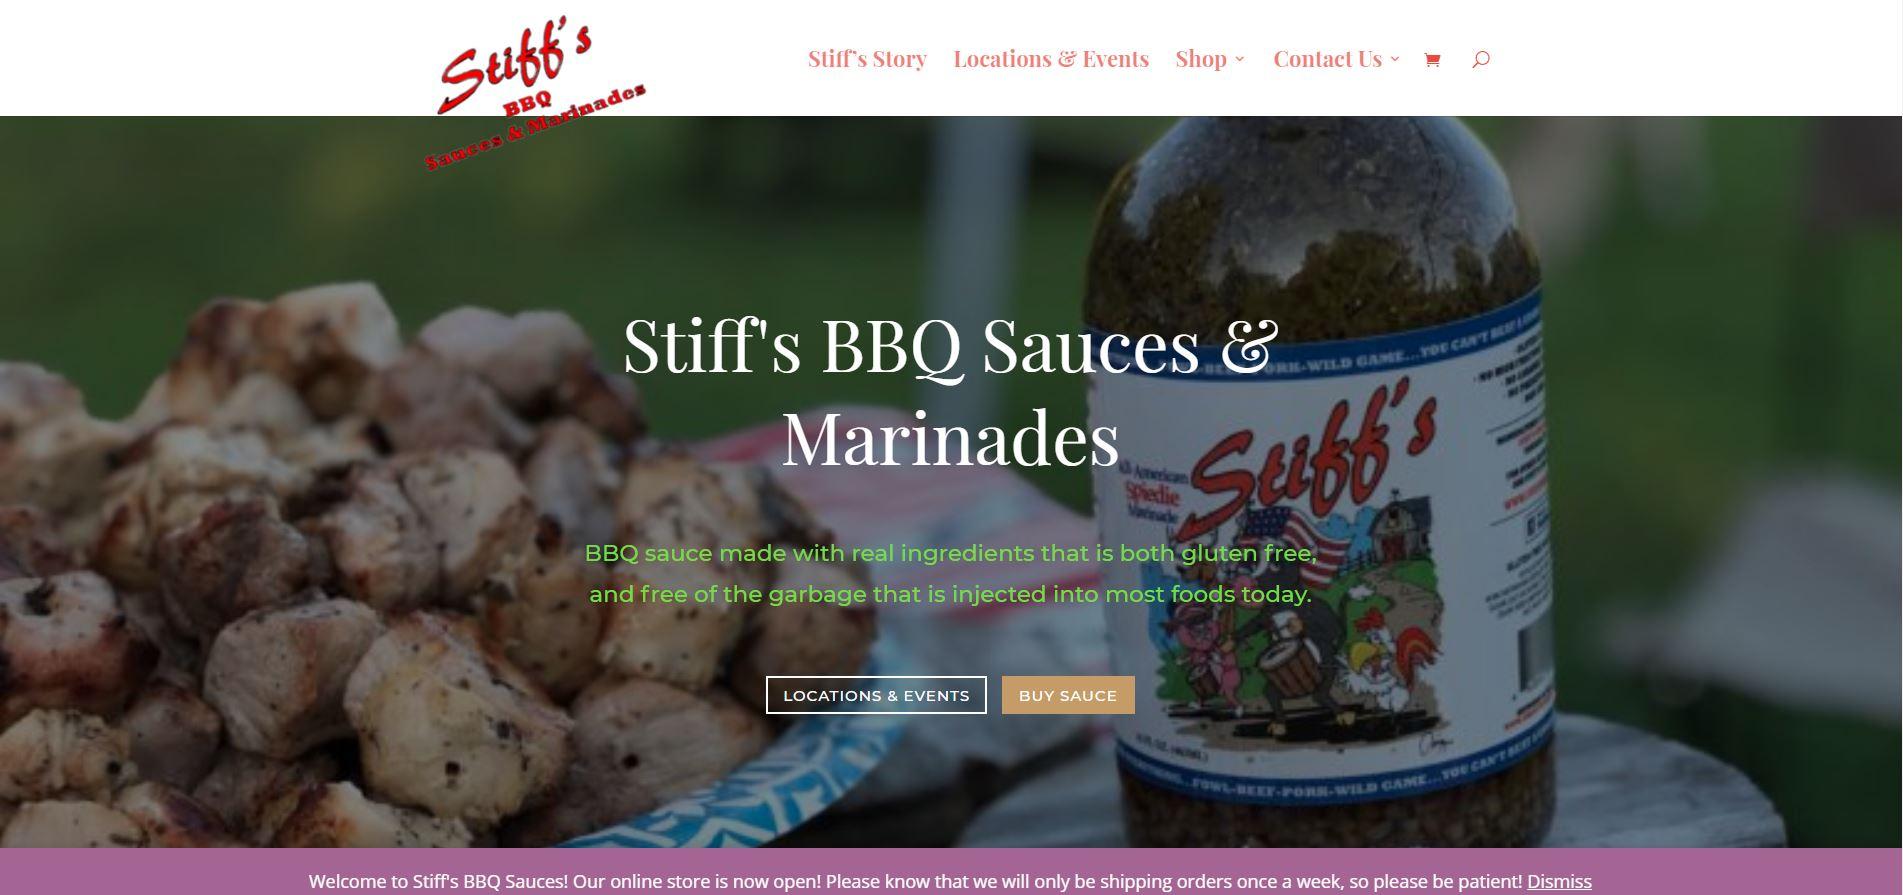 stiffs bbq sauces and marinades